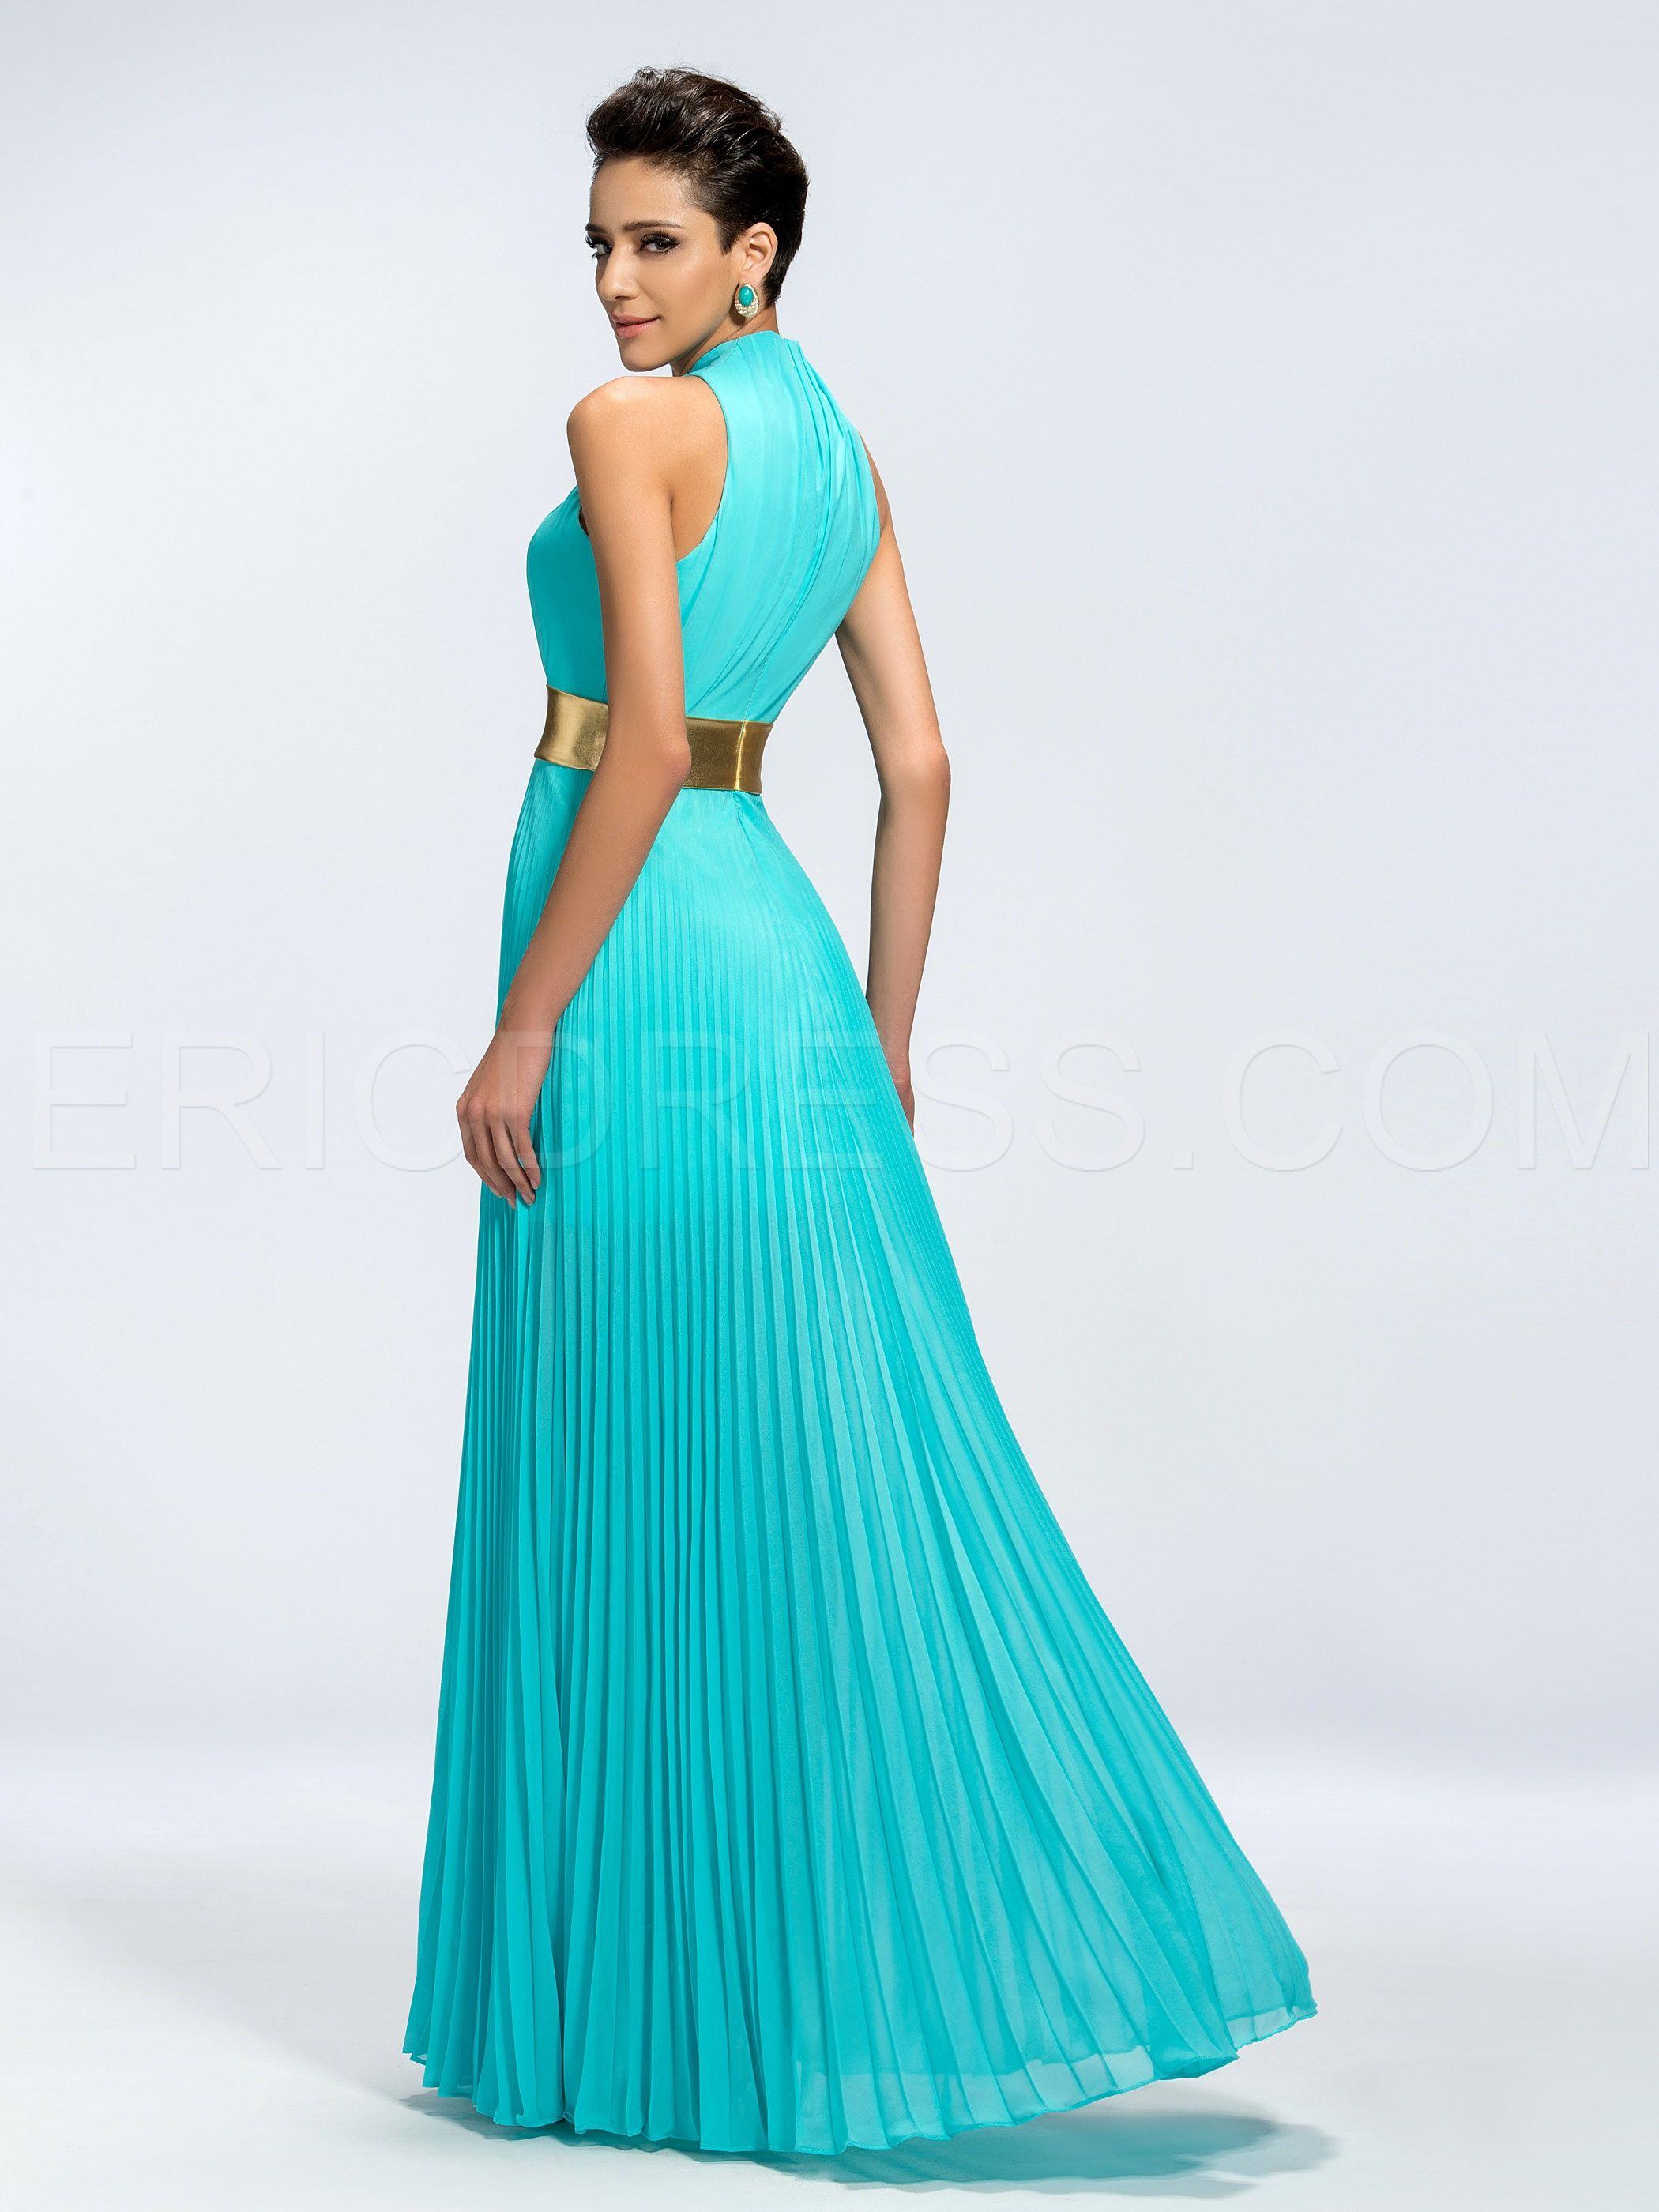 Classy vogue aline splitfront evening dress